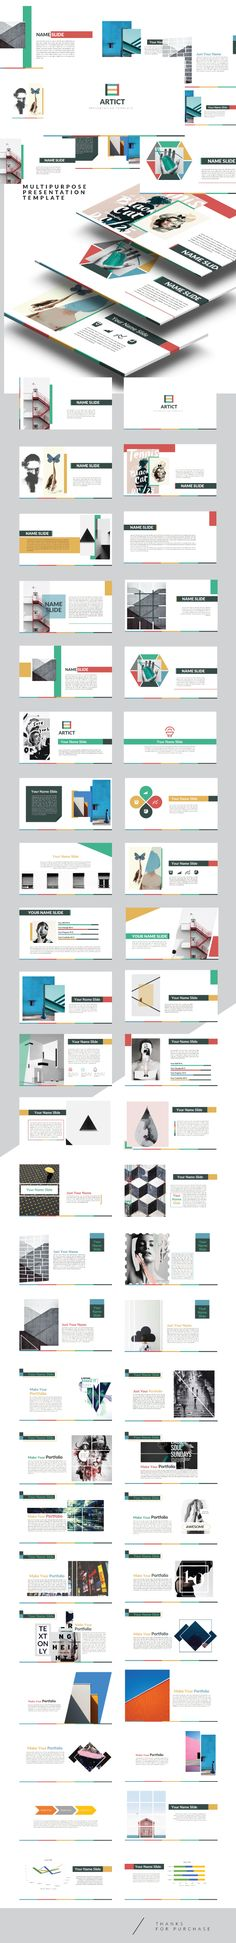 Artic - Multipurpose Powerpoint Creative template